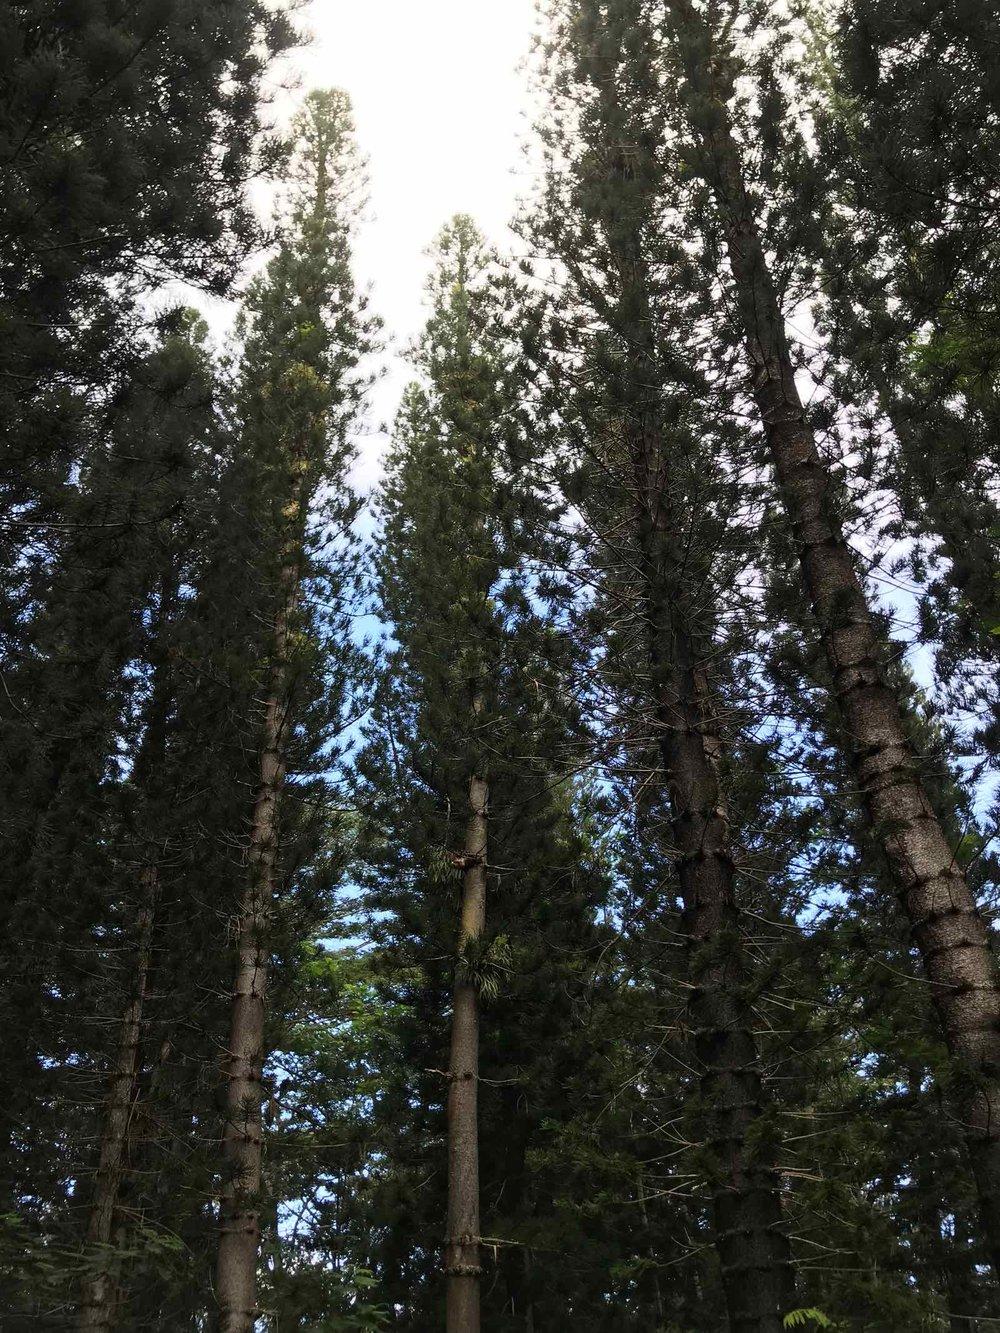 wai-kola-loop-trail-trees.jpg